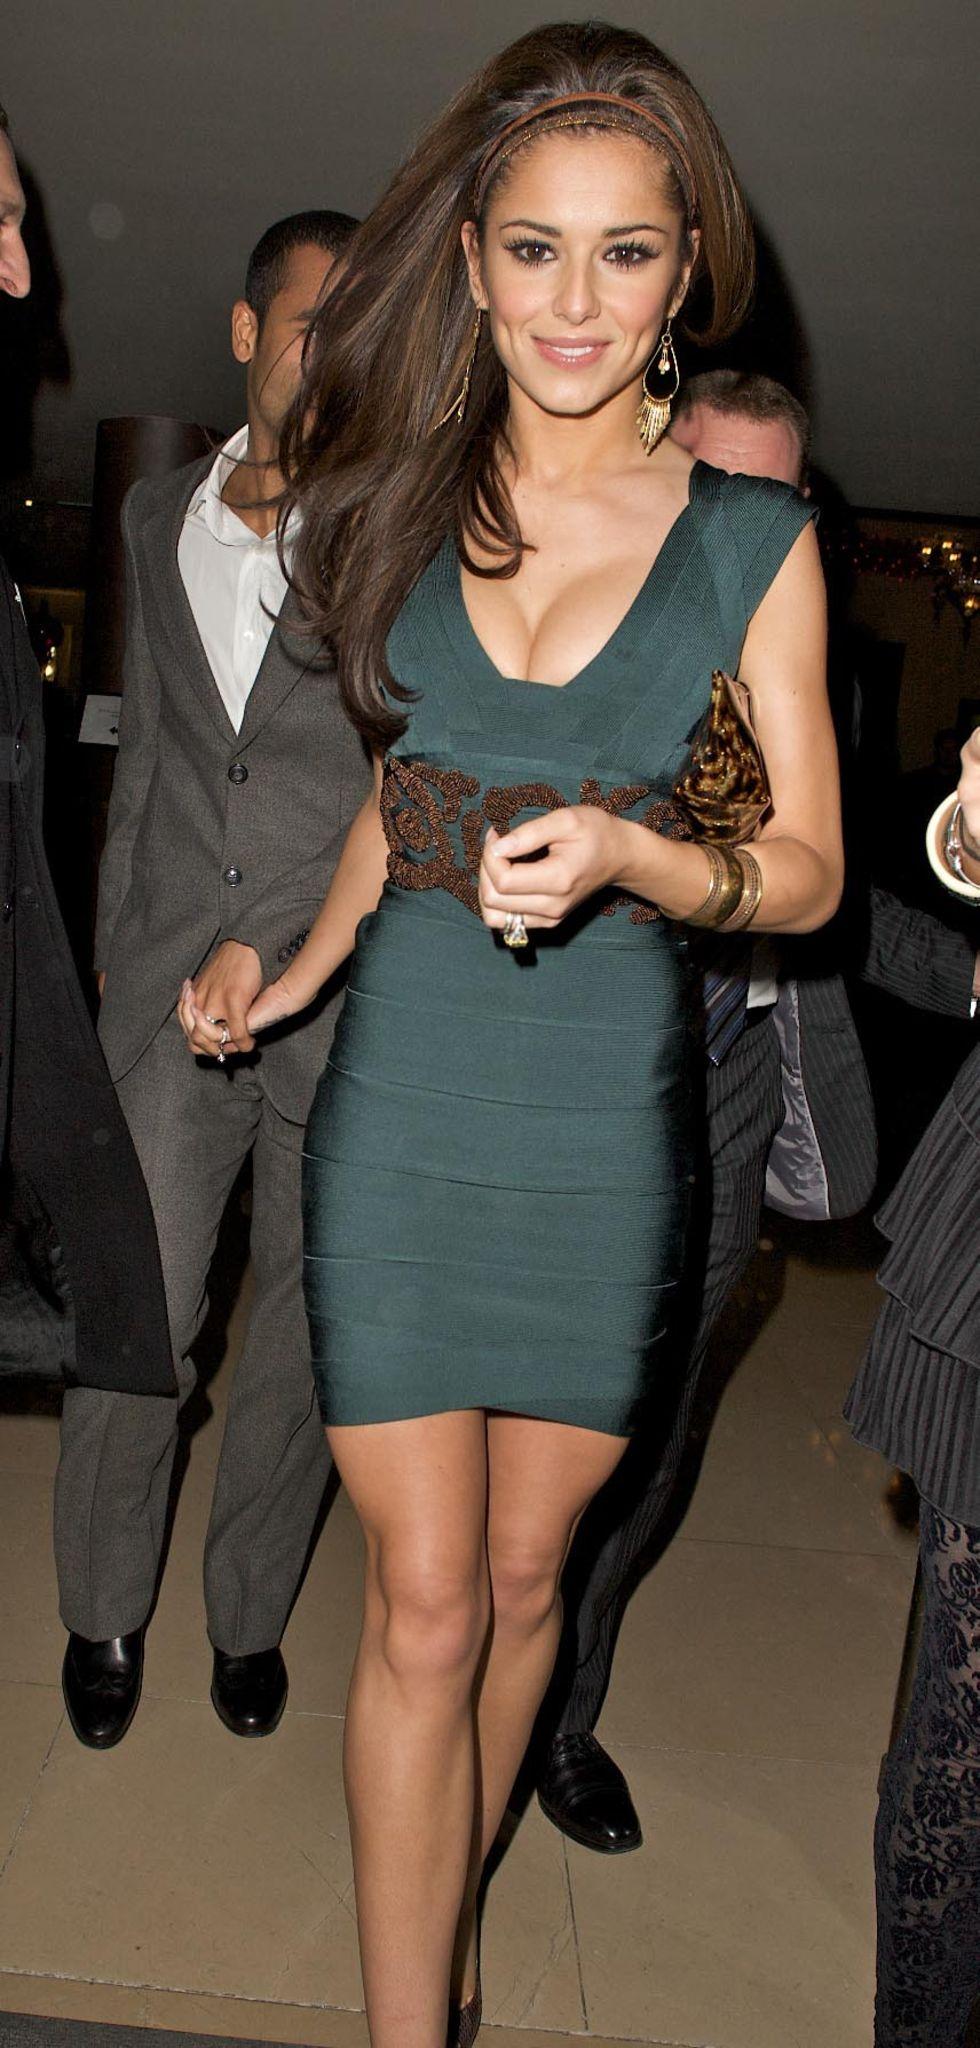 cheryl-tweedy-cleavage-candids-at-mayfair-hotel-in-london-mq-01